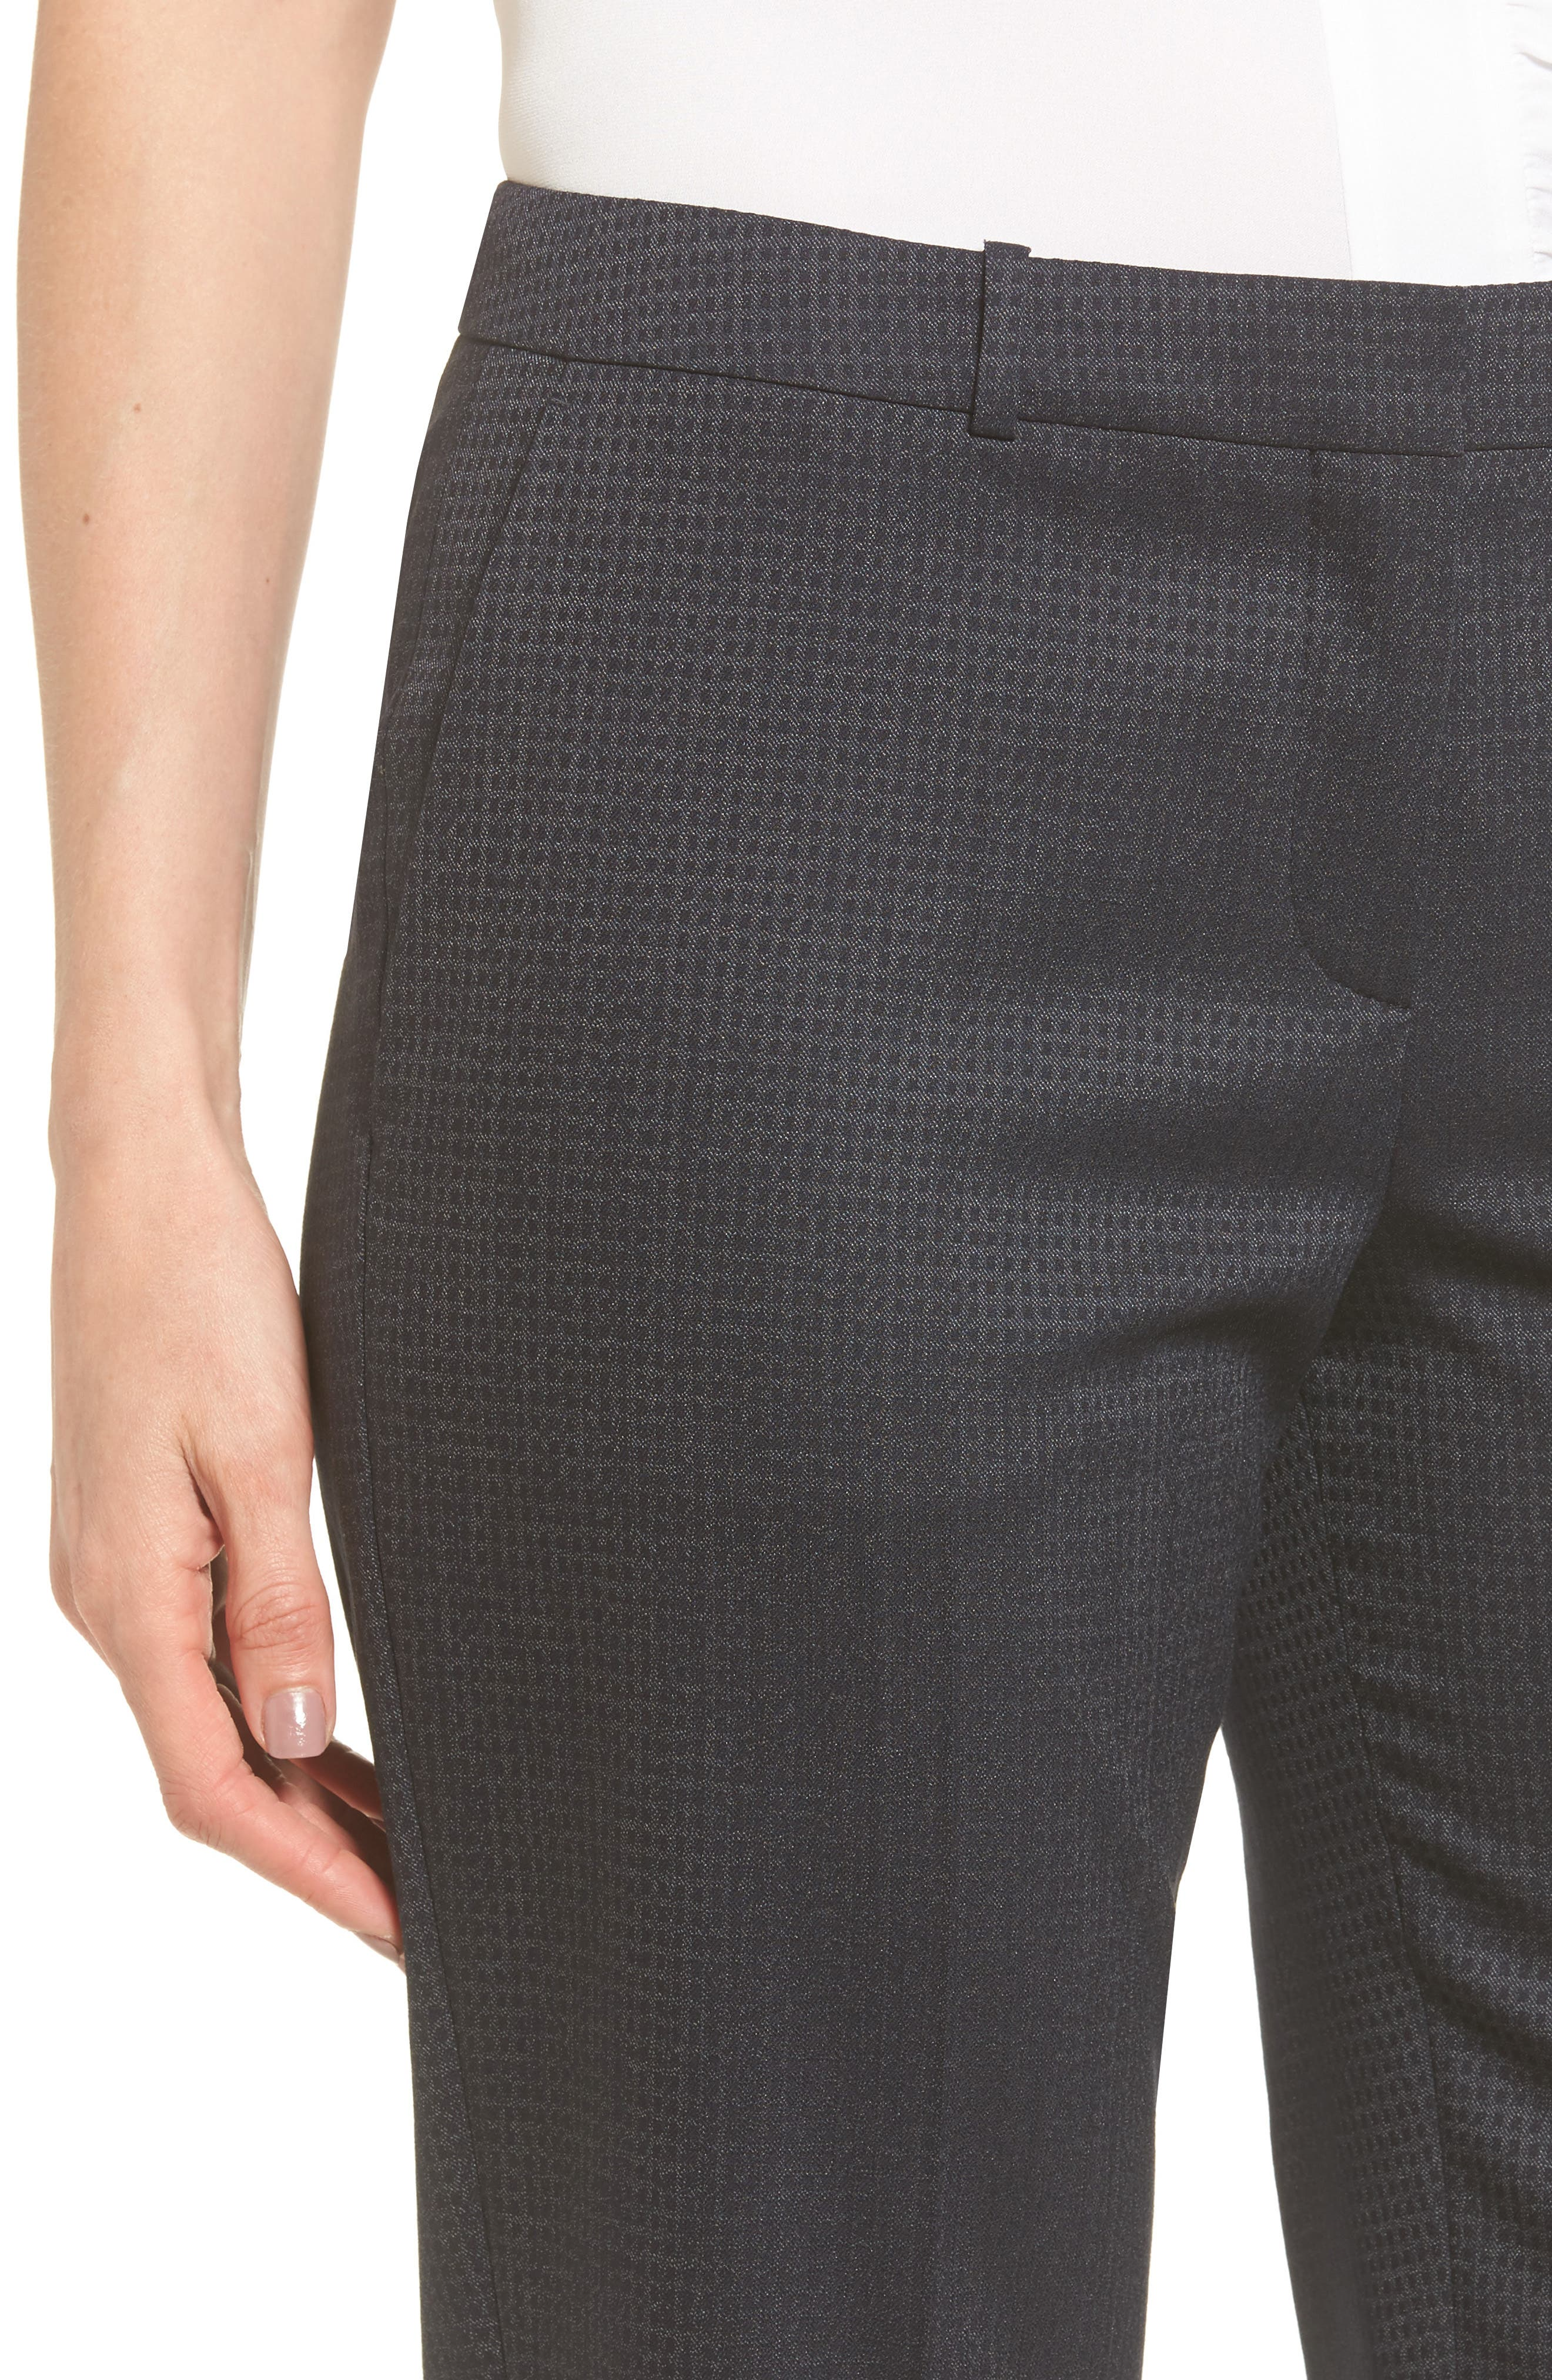 Tamea Stretch Wool Straight Leg Trousers,                             Alternate thumbnail 4, color,                             461